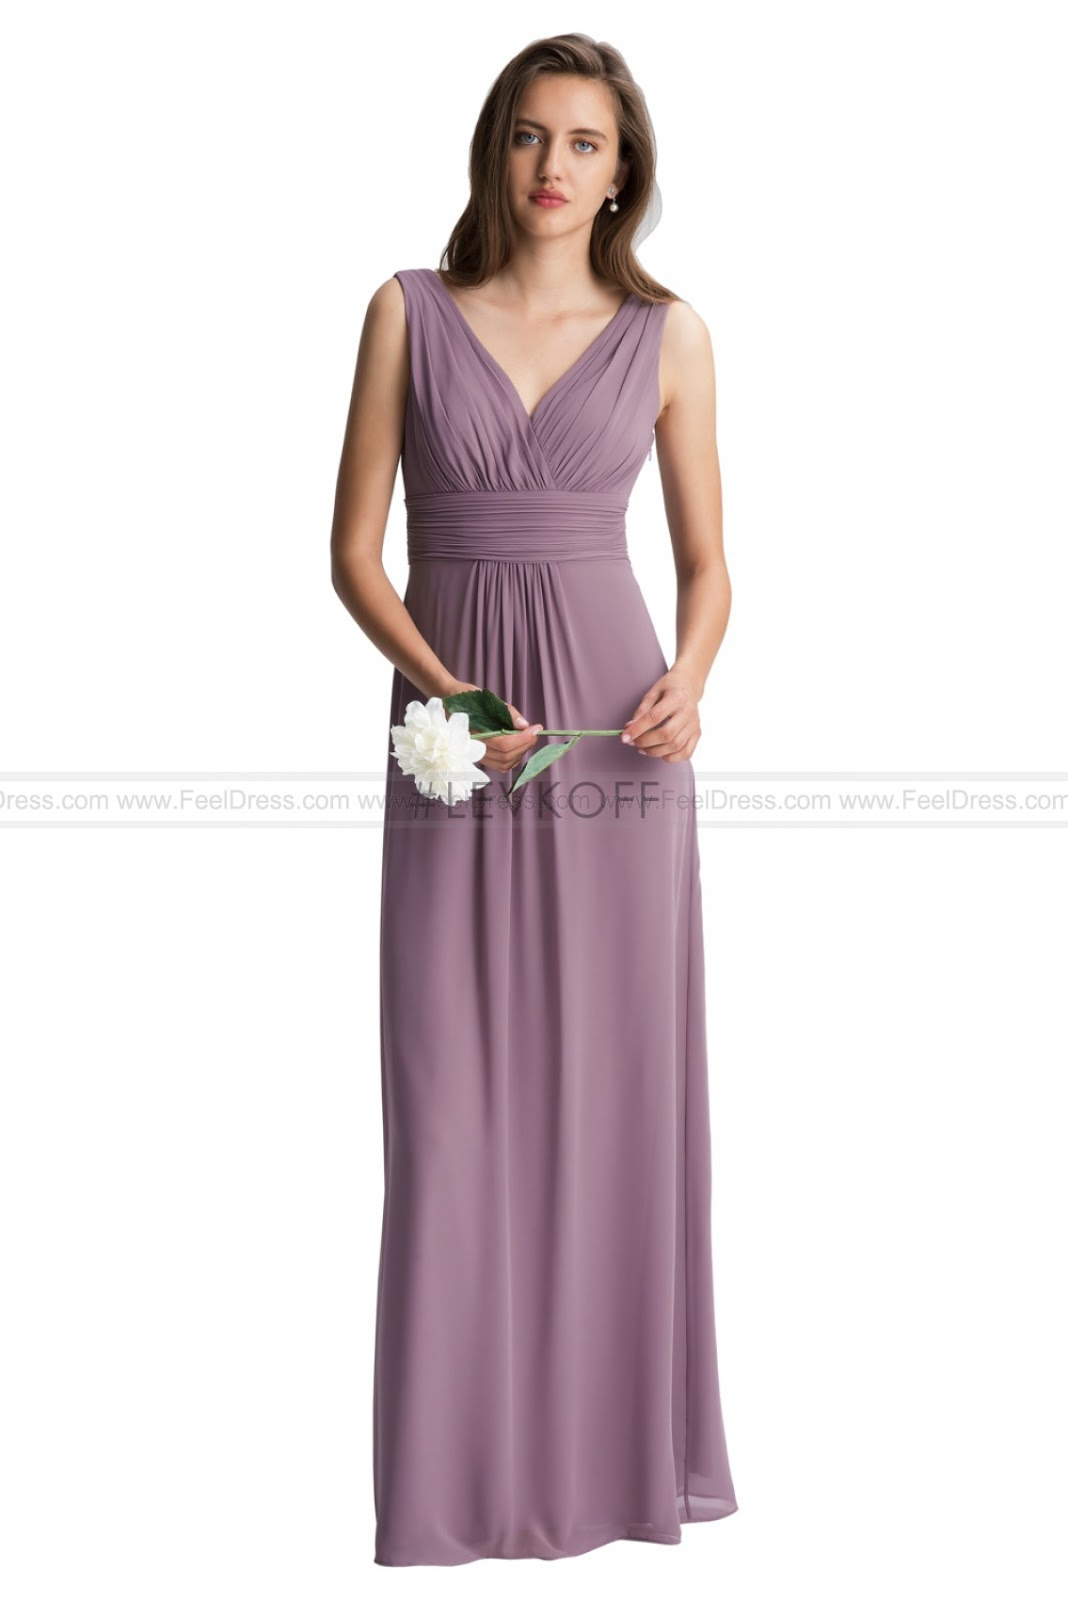 590c2d3c4e9b Bill Levkoff Bridesmaid Dress Style 7009